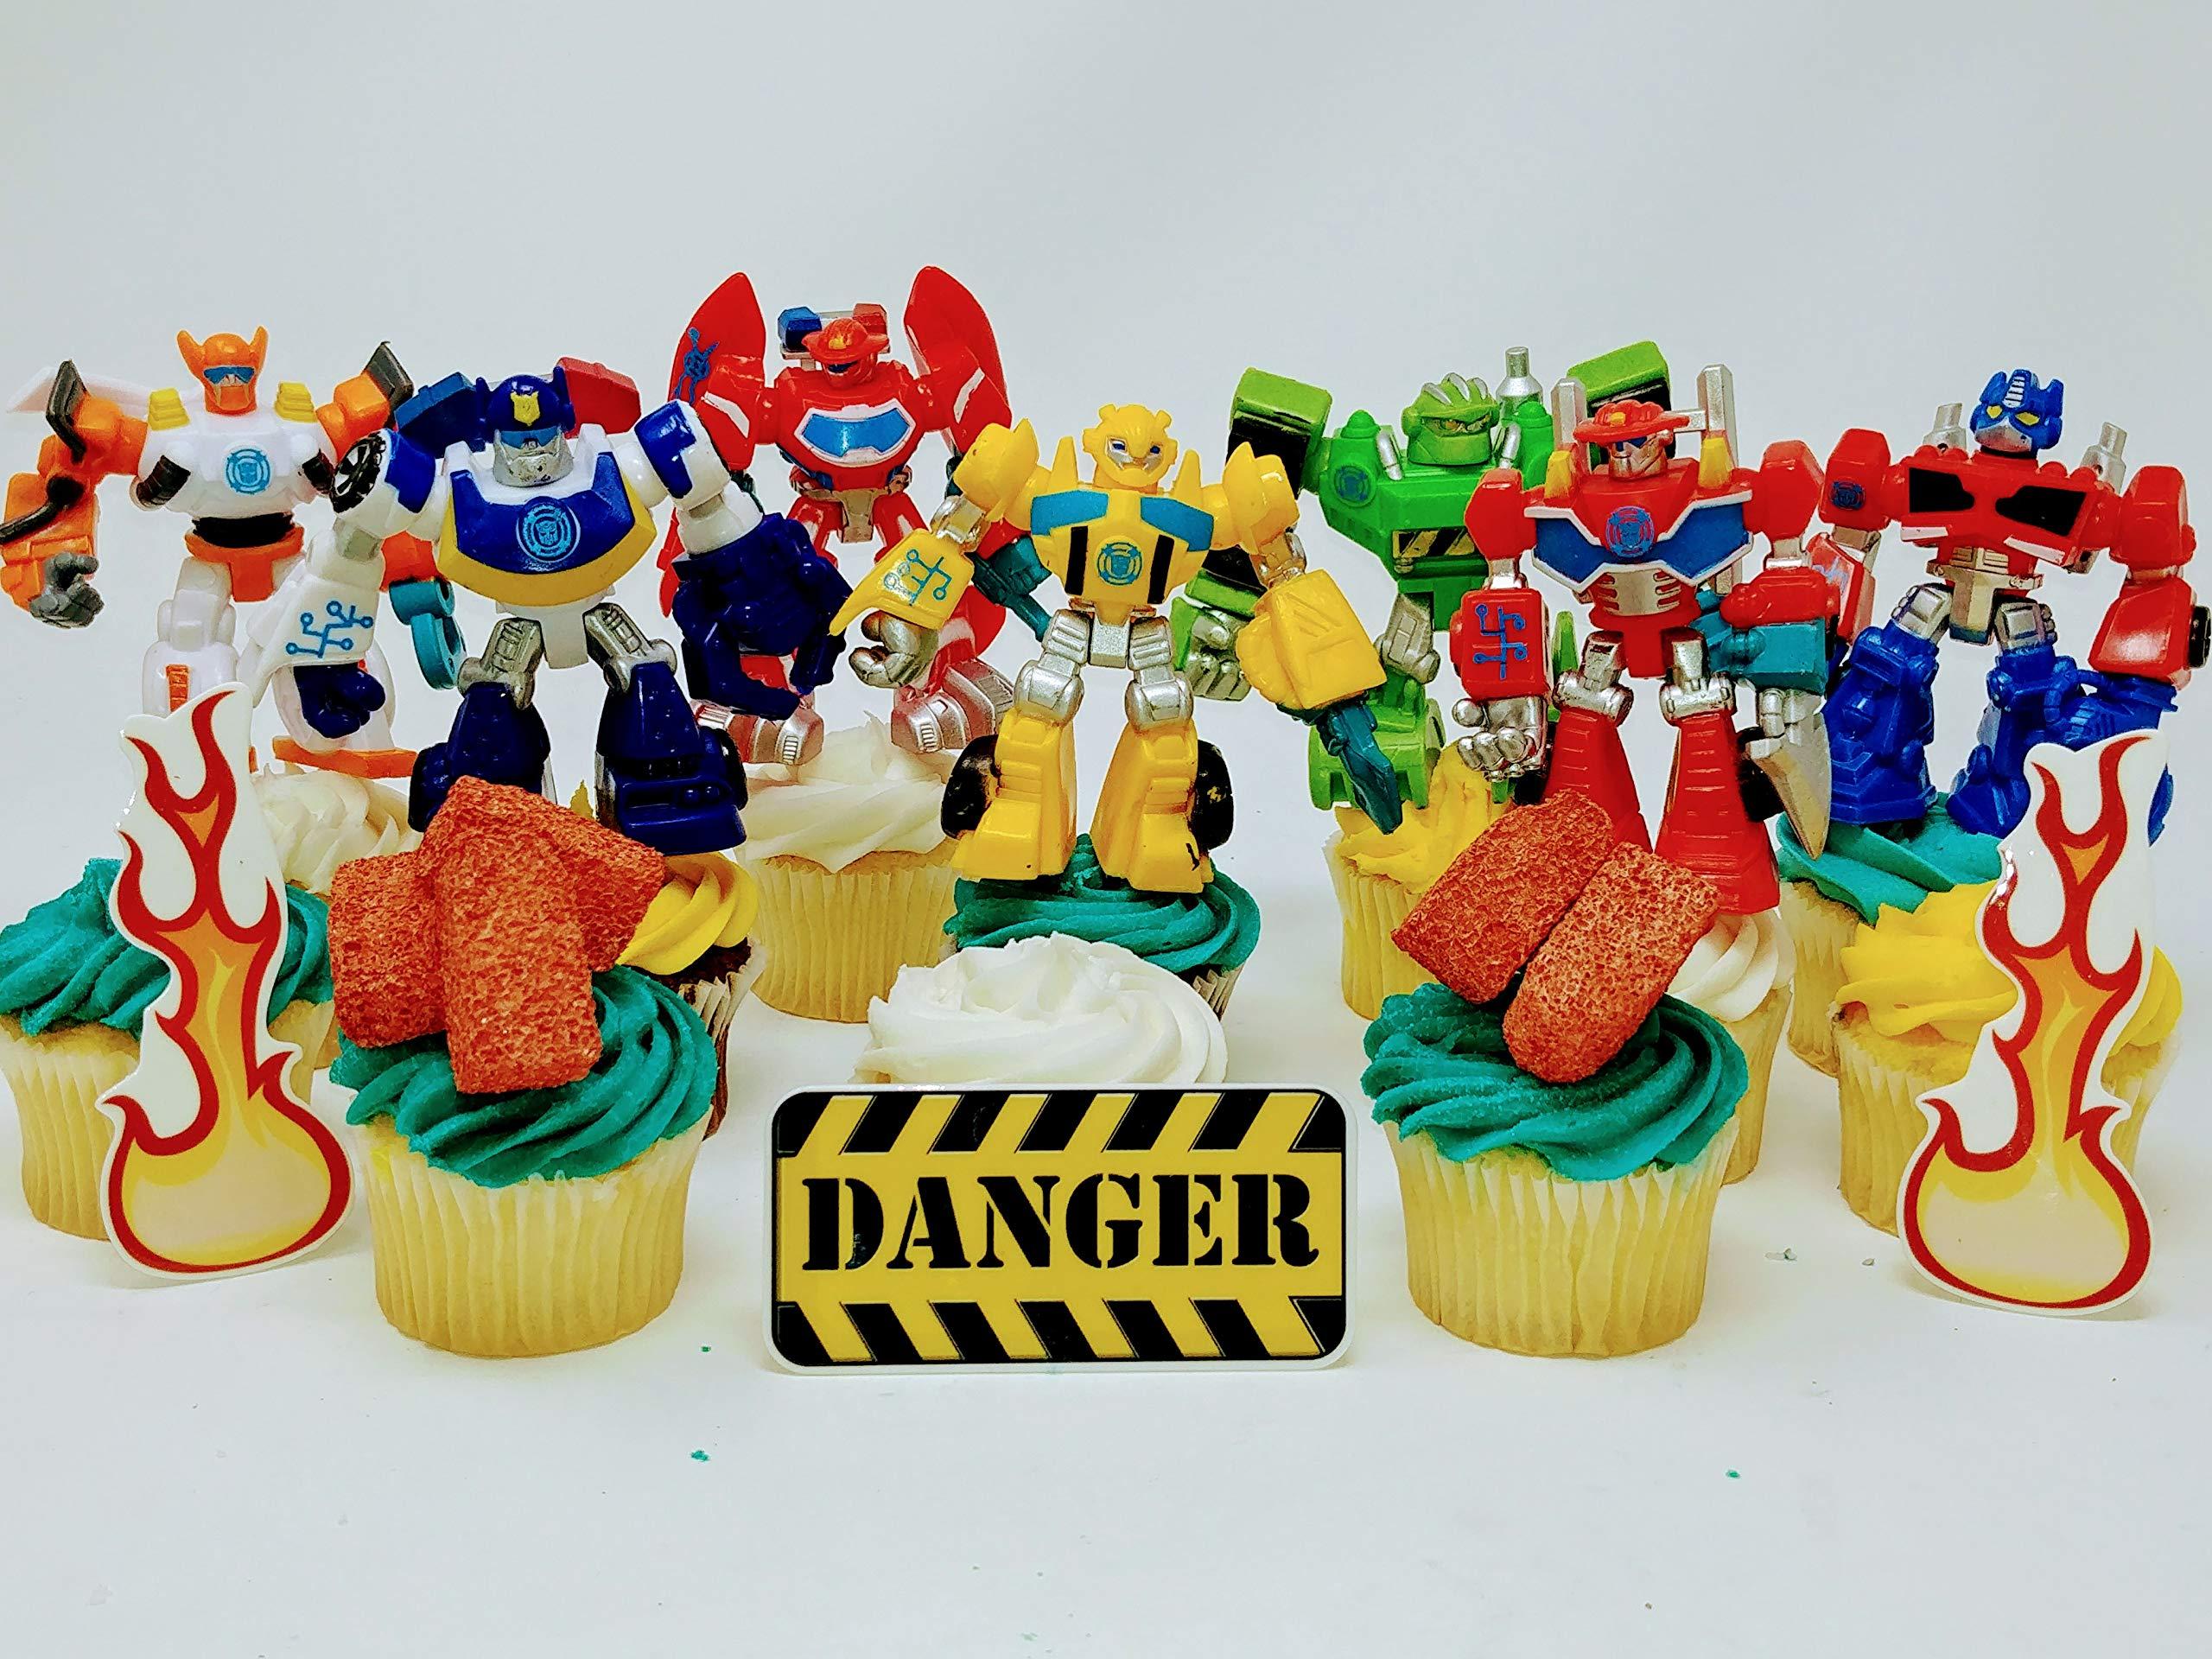 TRANSFORMER Birthday Cupcake Topper Set Featuring RANDOM Transformer Figures and Accessories